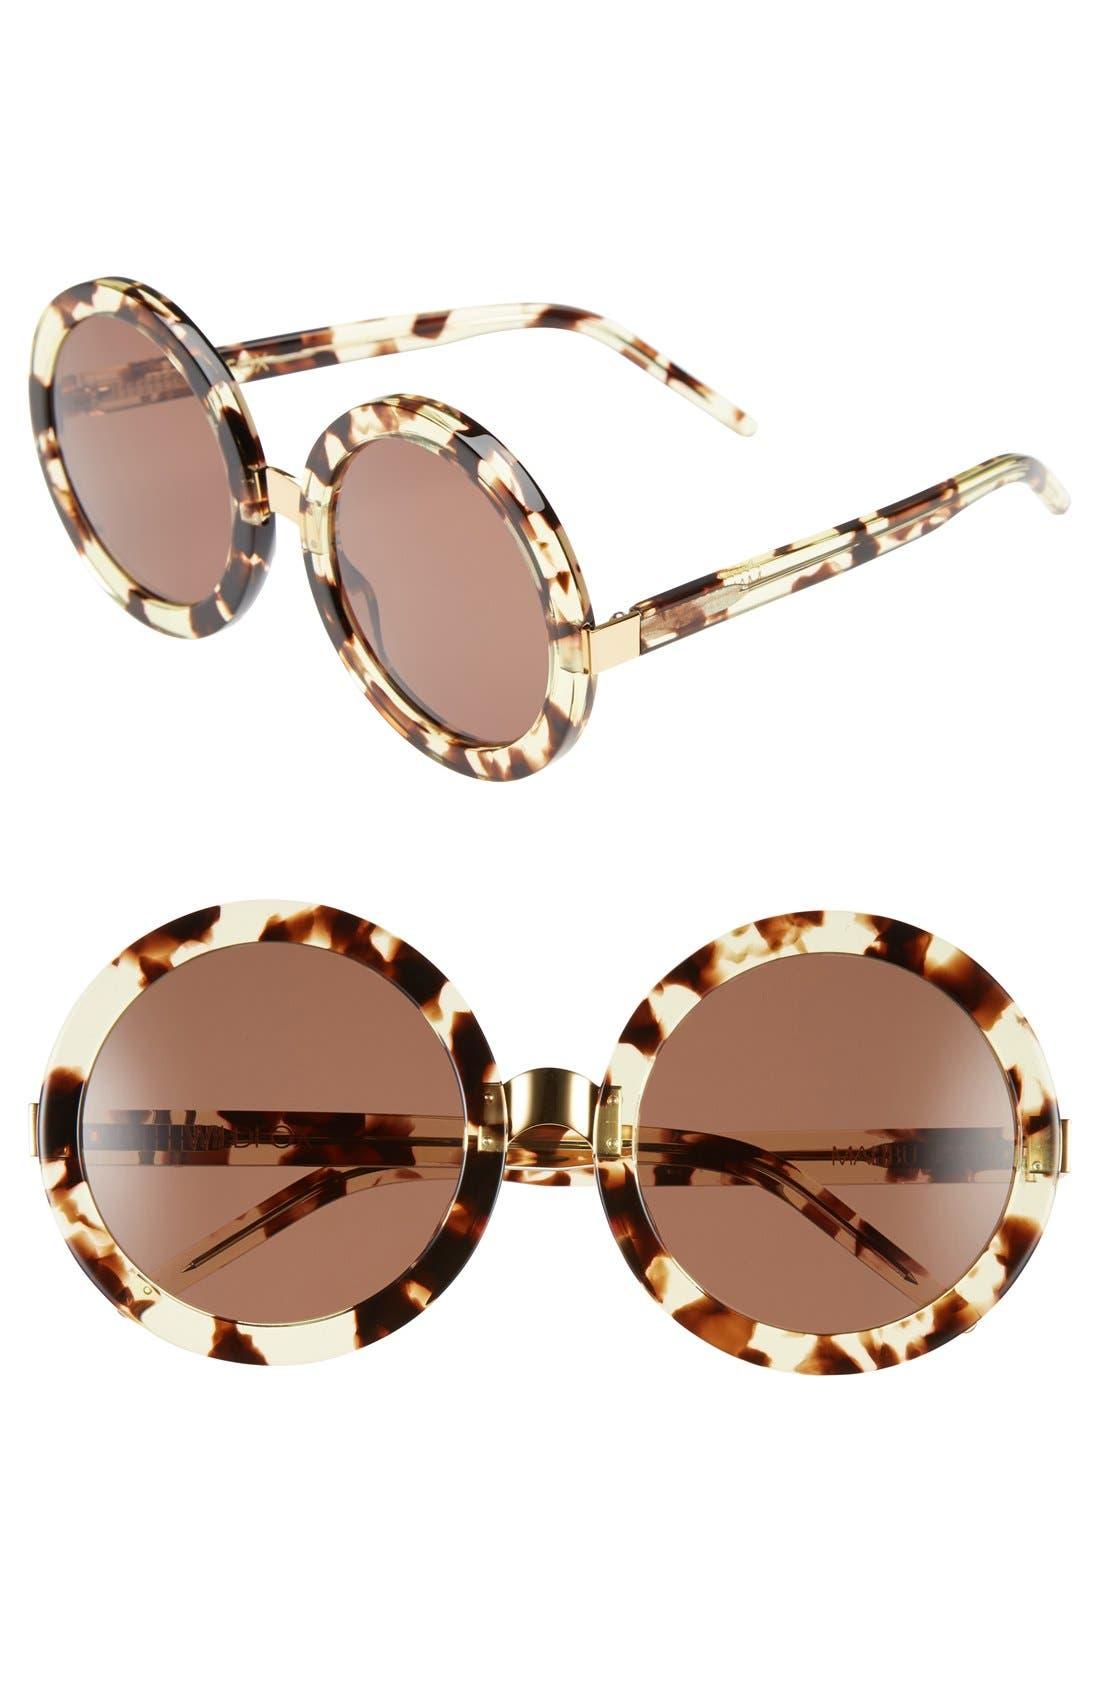 Main Image - Wildfox 'Malibu' 56mm Round Sunglasses